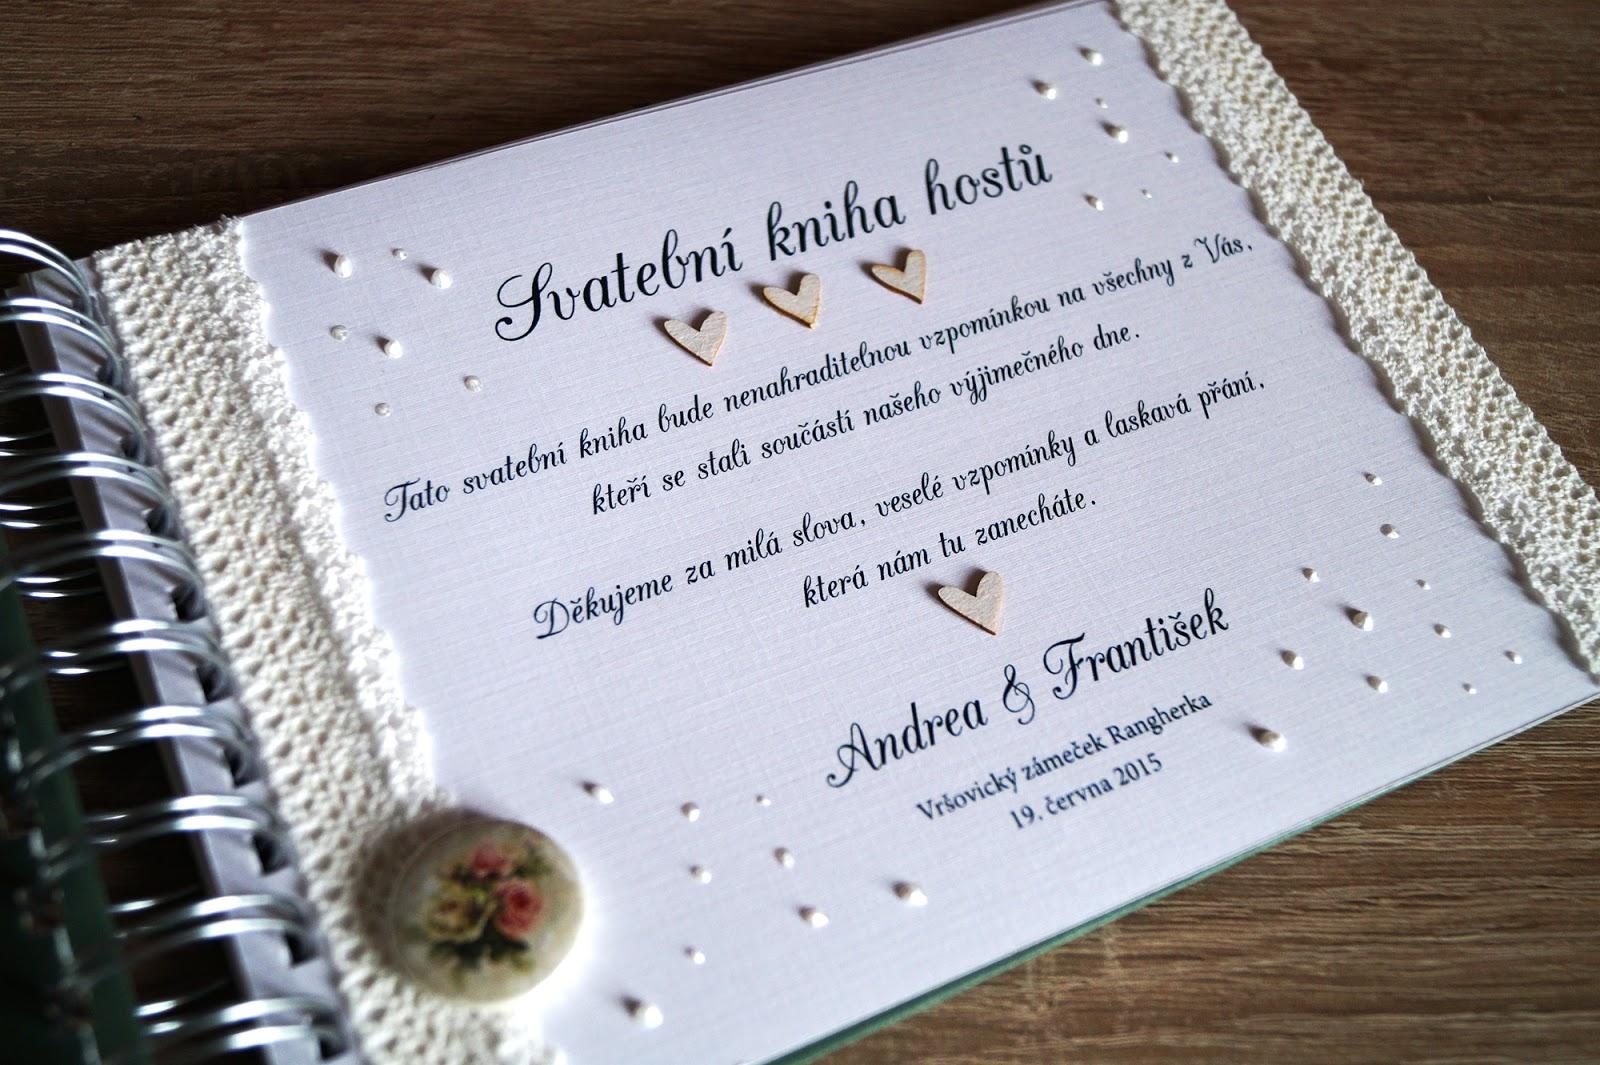 WEDDING ALBUM - Svatební kniha hostů